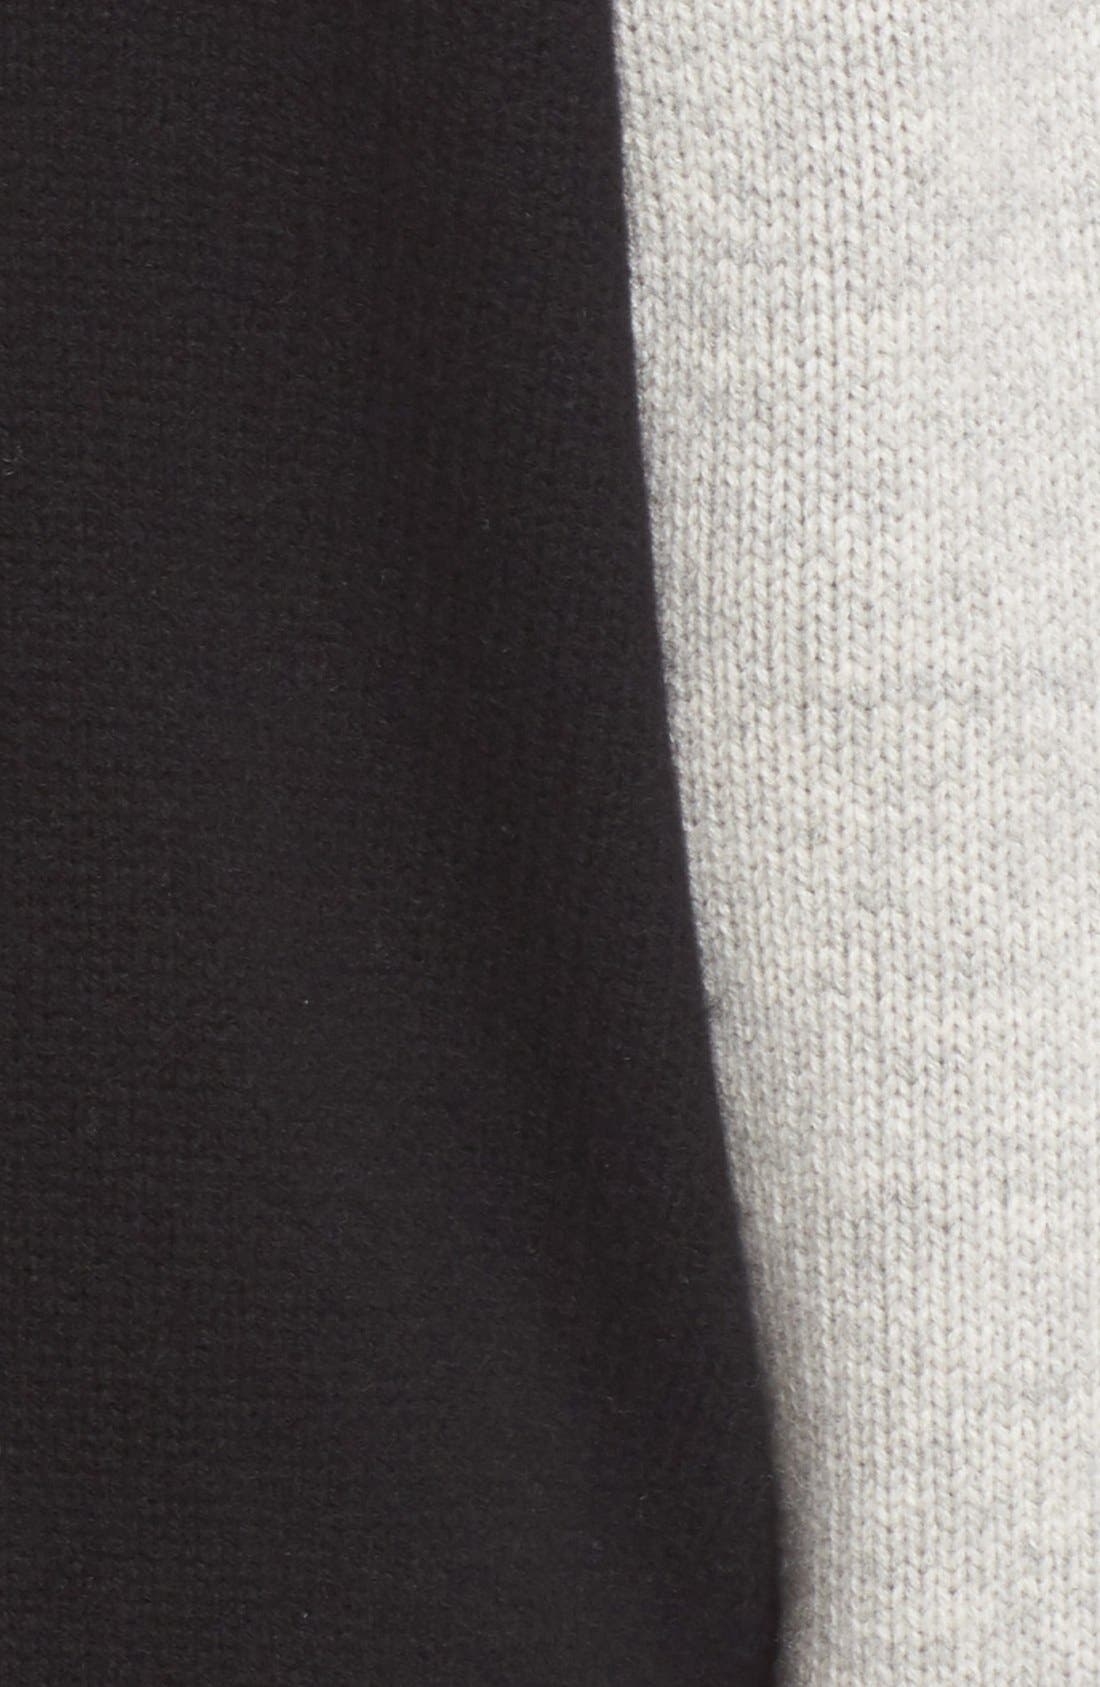 Stripe Detail Wool & Cashmere Knit Varsity Jacket,                             Alternate thumbnail 3, color,                             Black